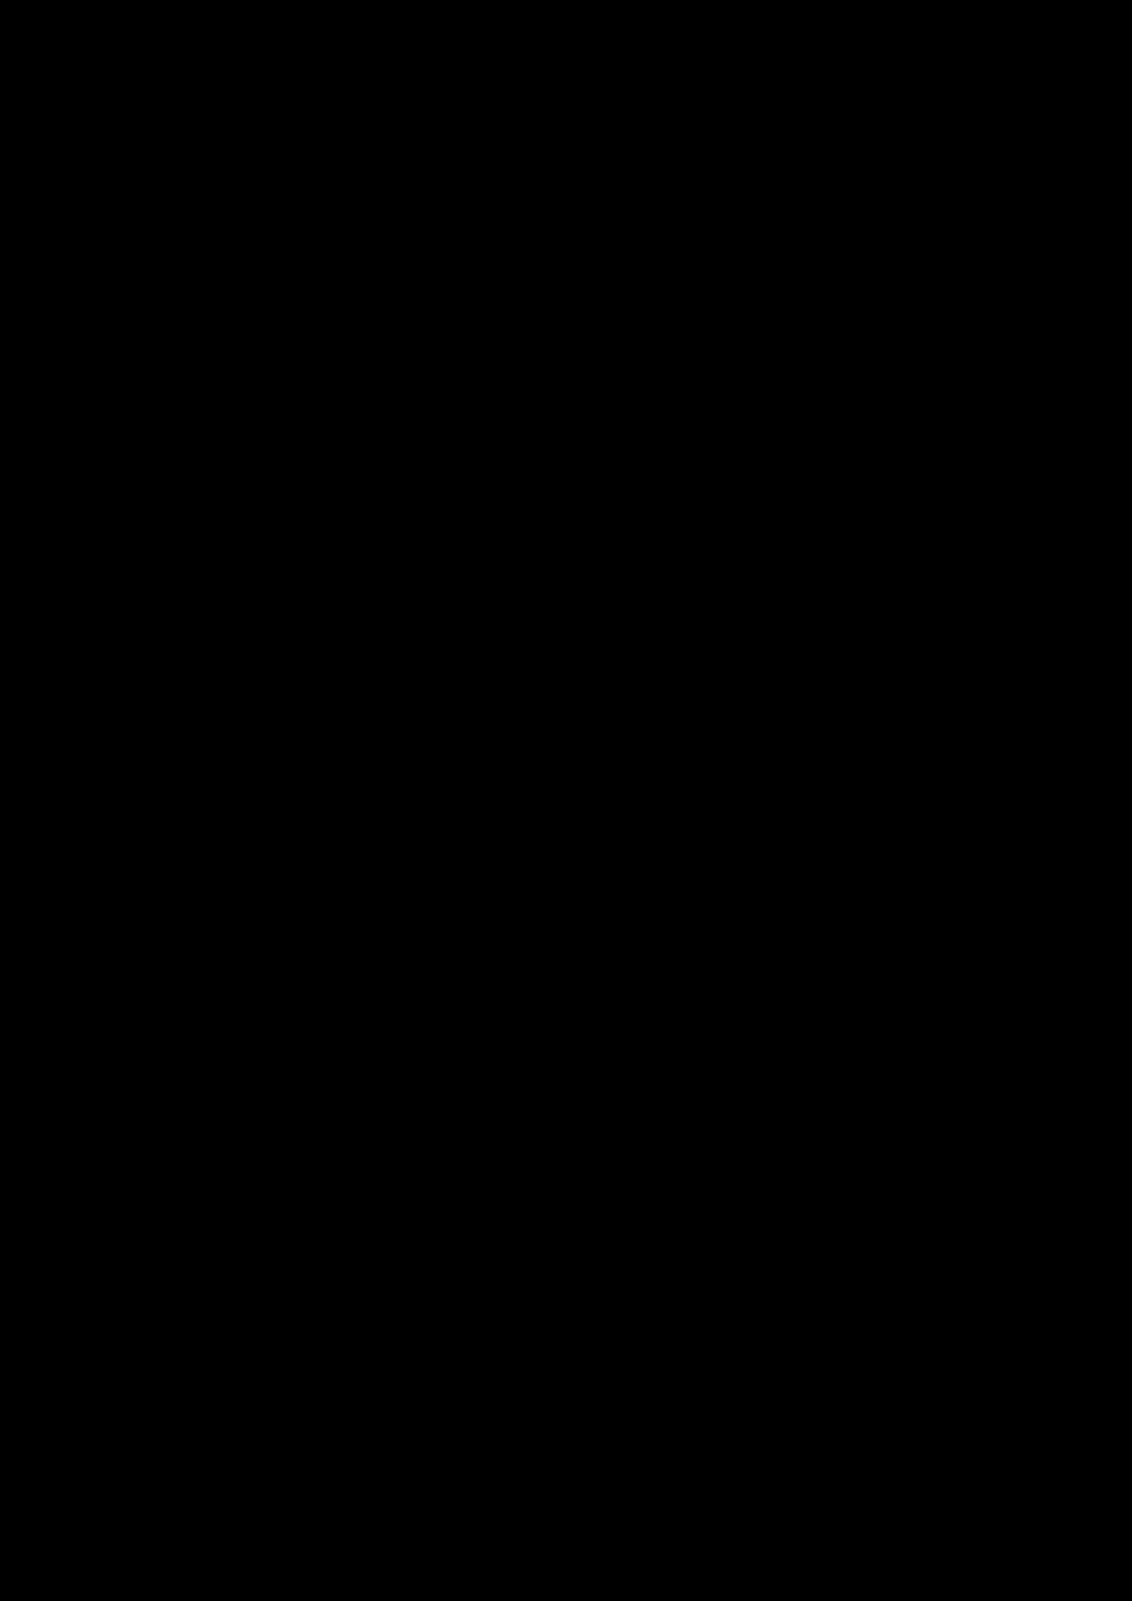 Korolevstvo slez slide, Image 68